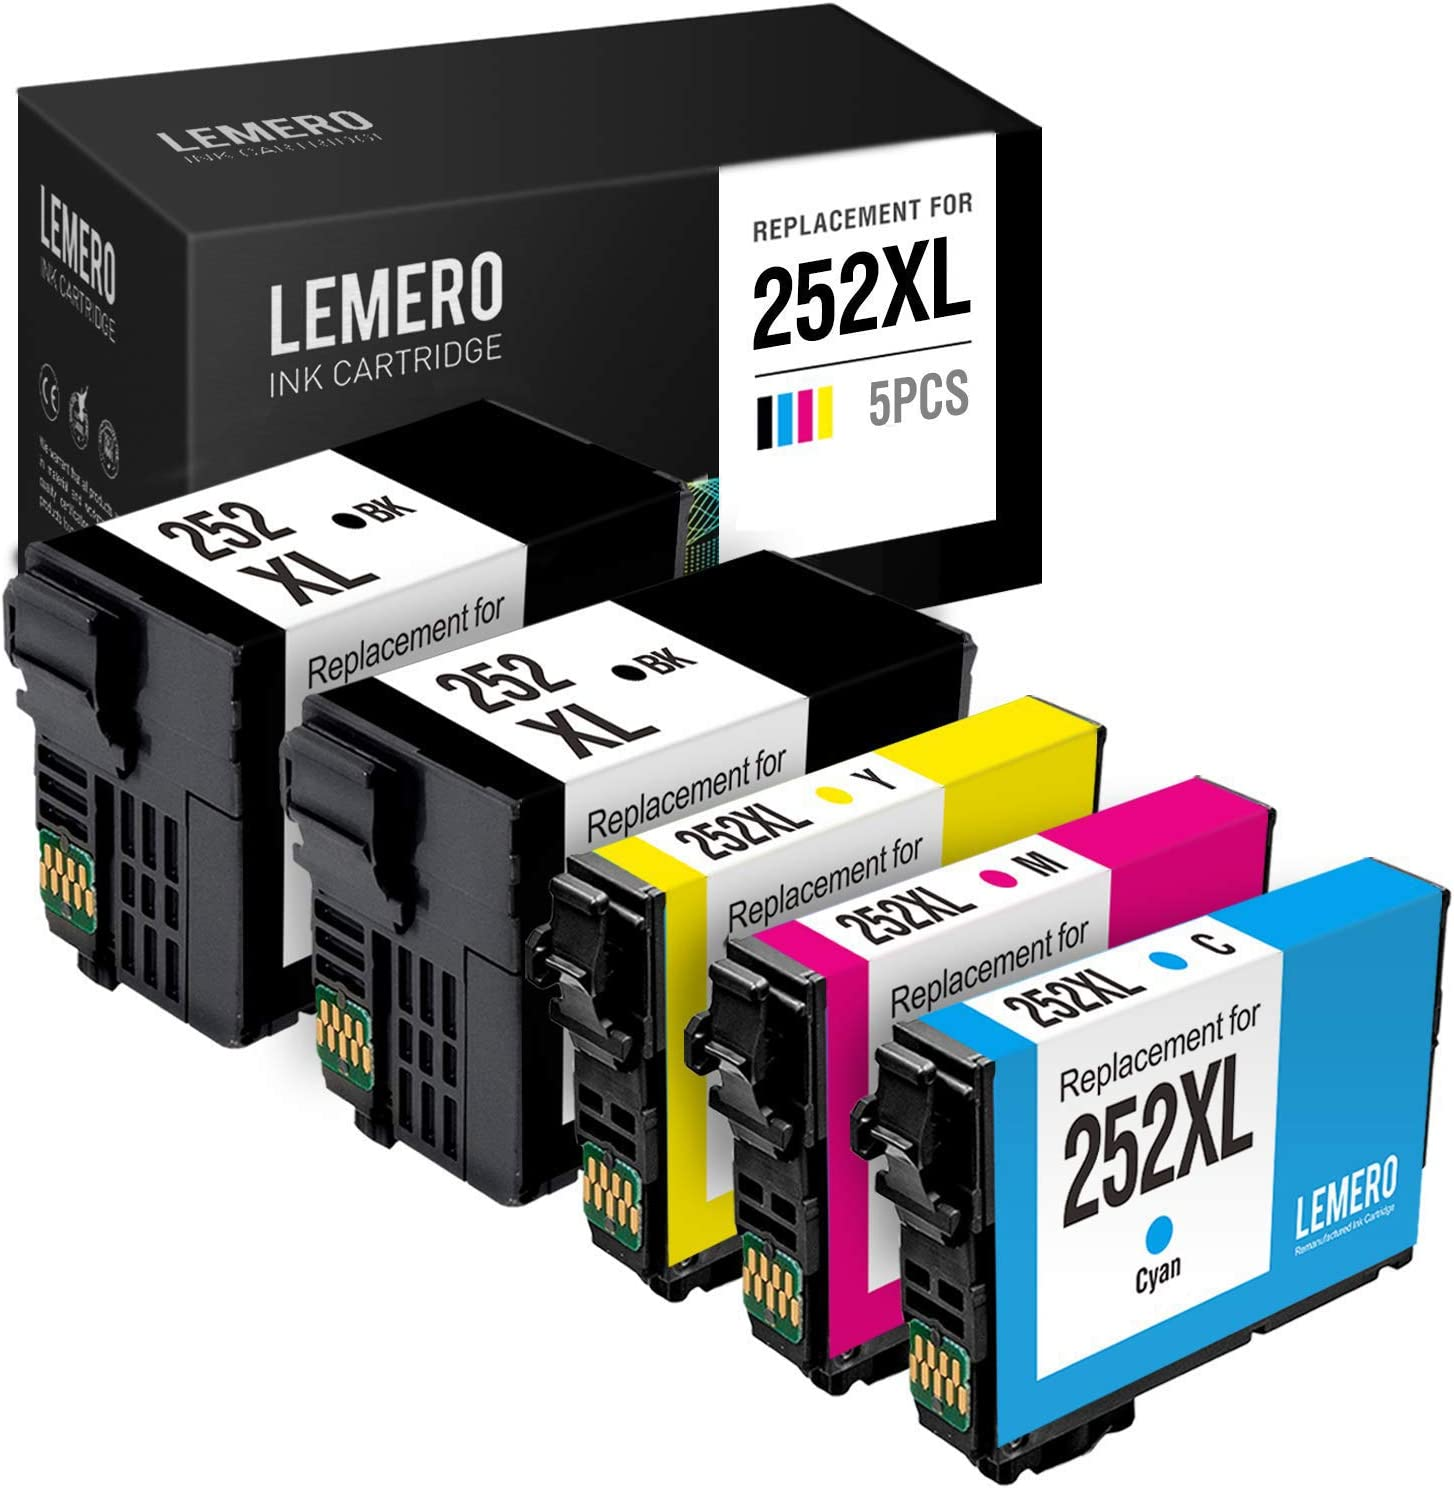 LEMERO Remanufactured Ink Cartridges Replacement for Epson 252 252XL 252 XL for Workforce WF-7720 WF-7710 WF-3640 WF-3620 WF-7620 WF-7610 WF-7210 (2 Black, 1 Cyan, 1 Magenta, 1 Yellow, 5-Pack)